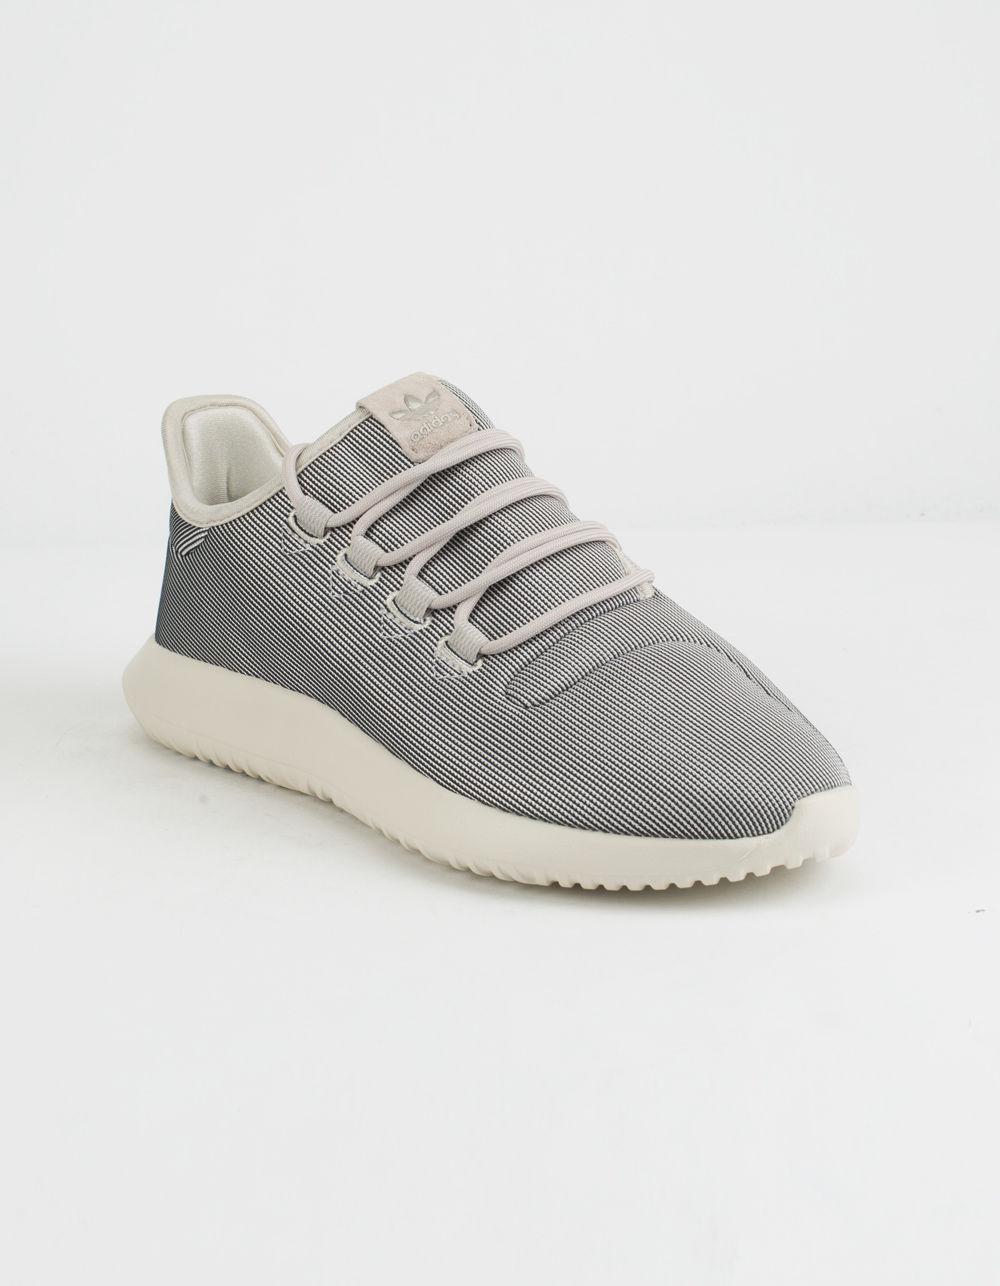 5e44b848214 Lyst - adidas Tubular Shadow Platinum Metallic Womens Shoes in Gray